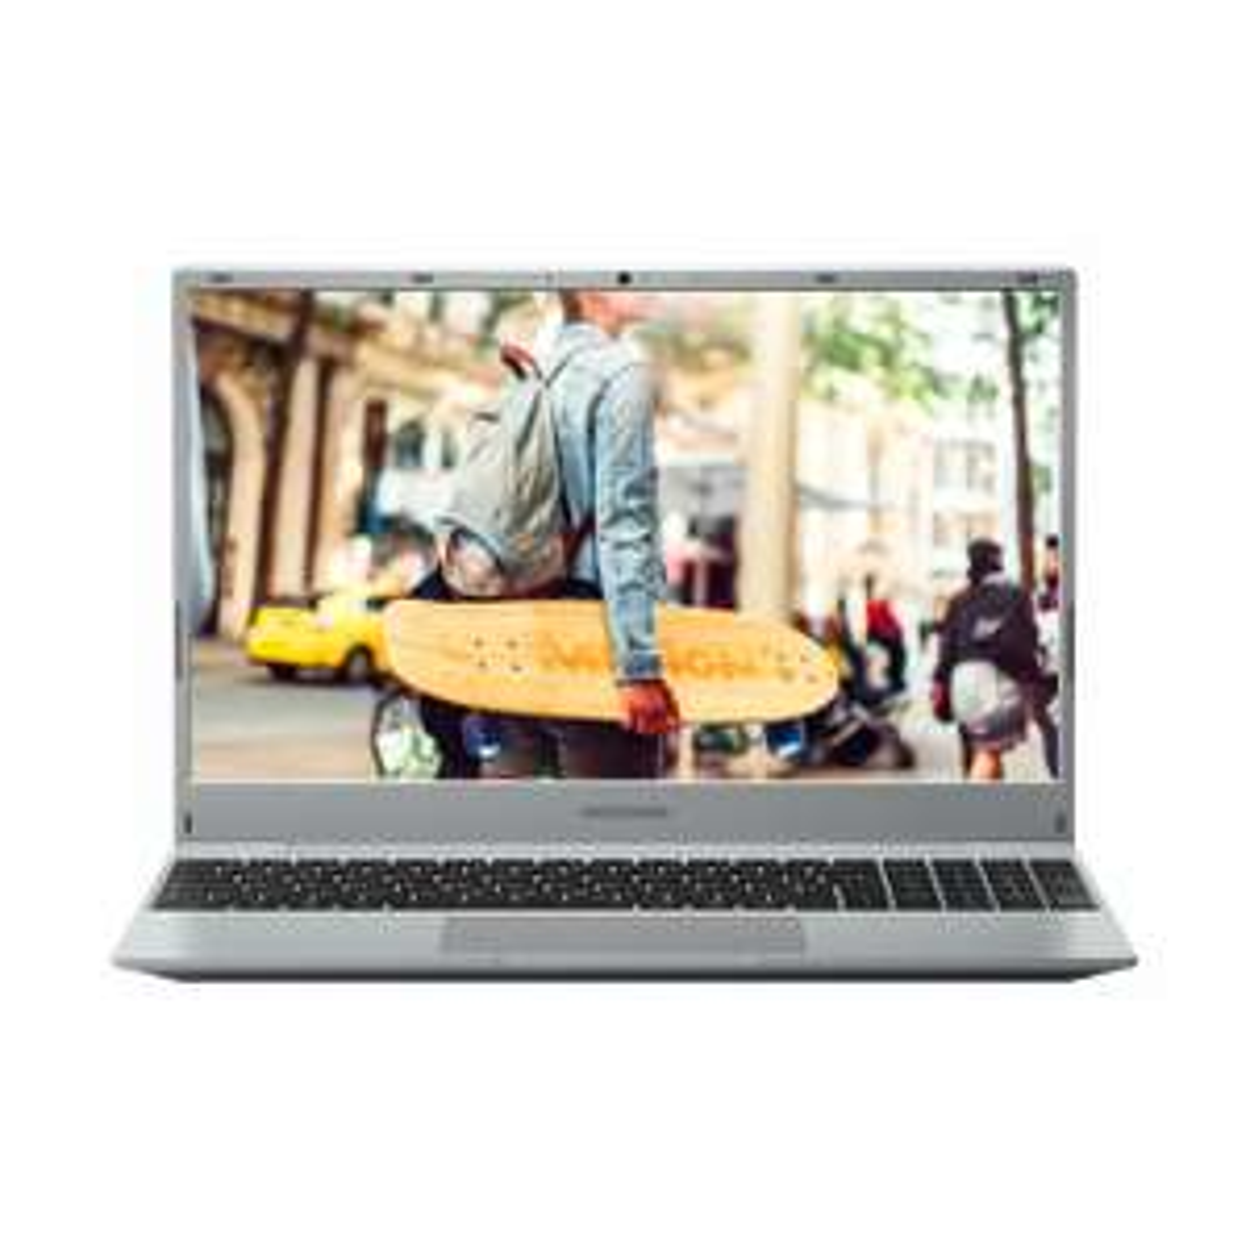 Notebook MEDION E15408 (MD 63690), 15,6'' FHD IPS, i5-1035G4, 8+256GB, Windows 10 [Online]